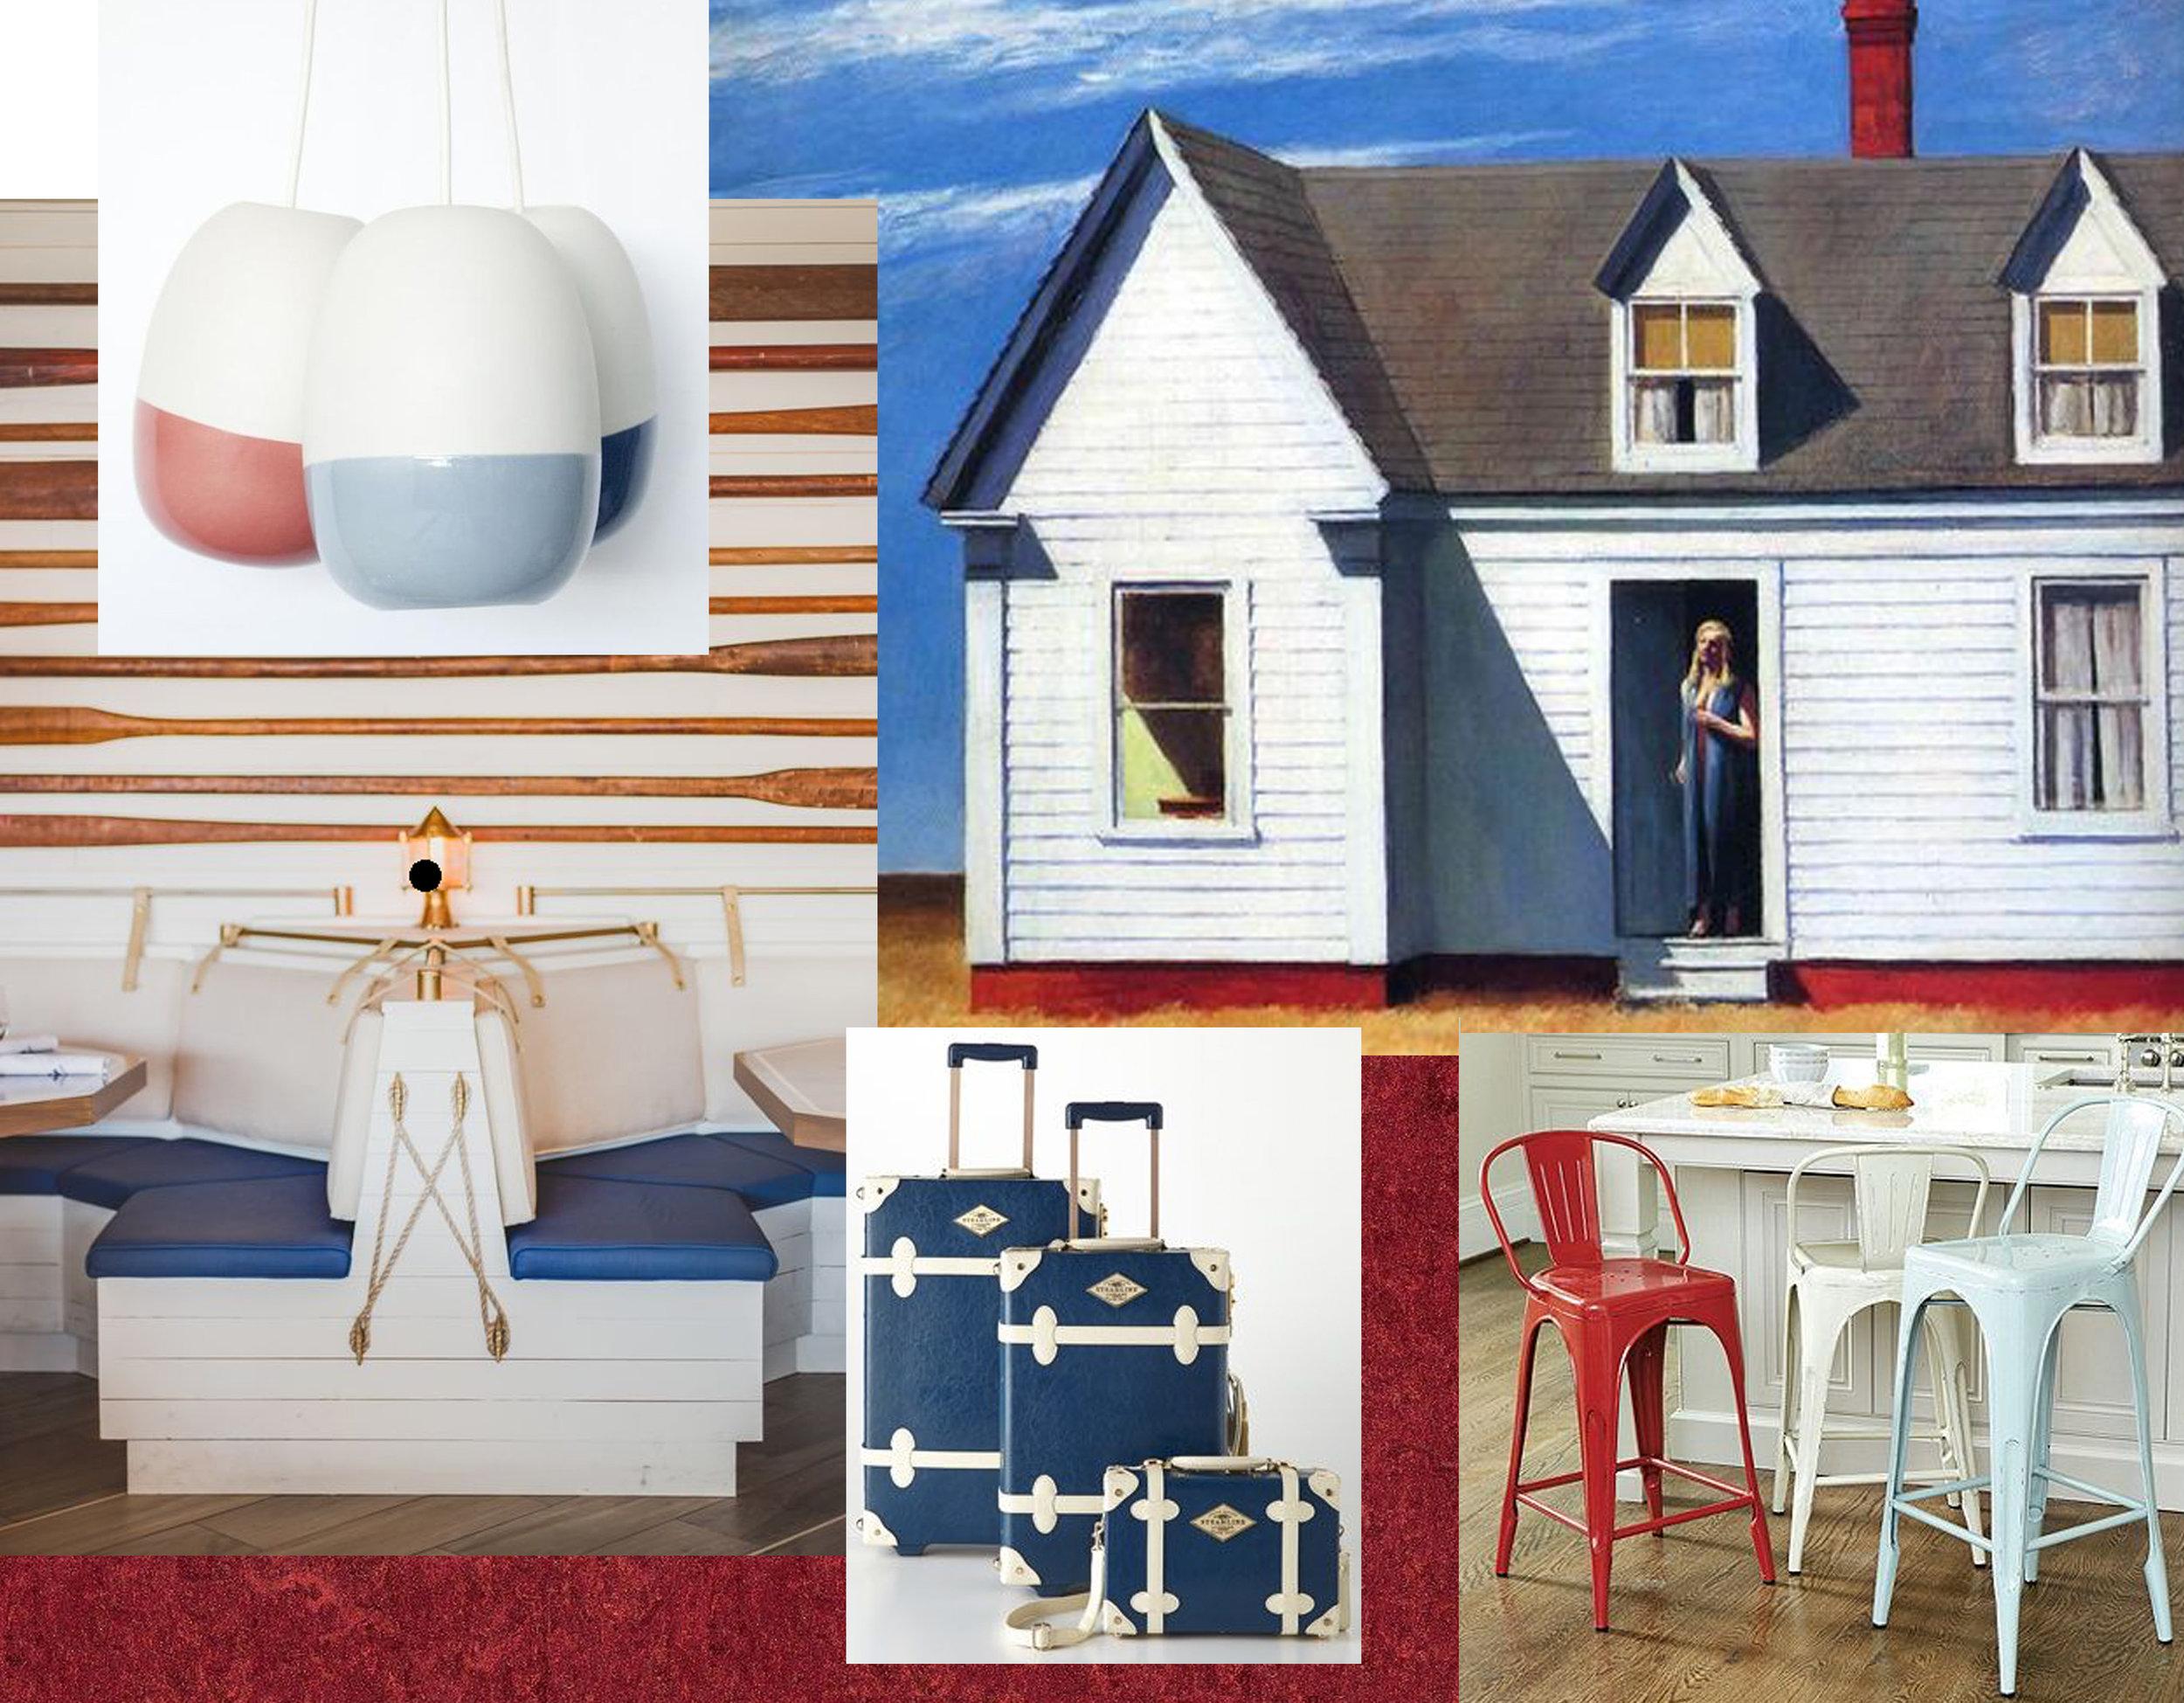 painting High Noon - The Yacht Club  Petermax  - Mariner Lamp via  Remodelista  - suitcases via Pinterest - Marian Metal Counter stool via  Ballard Design